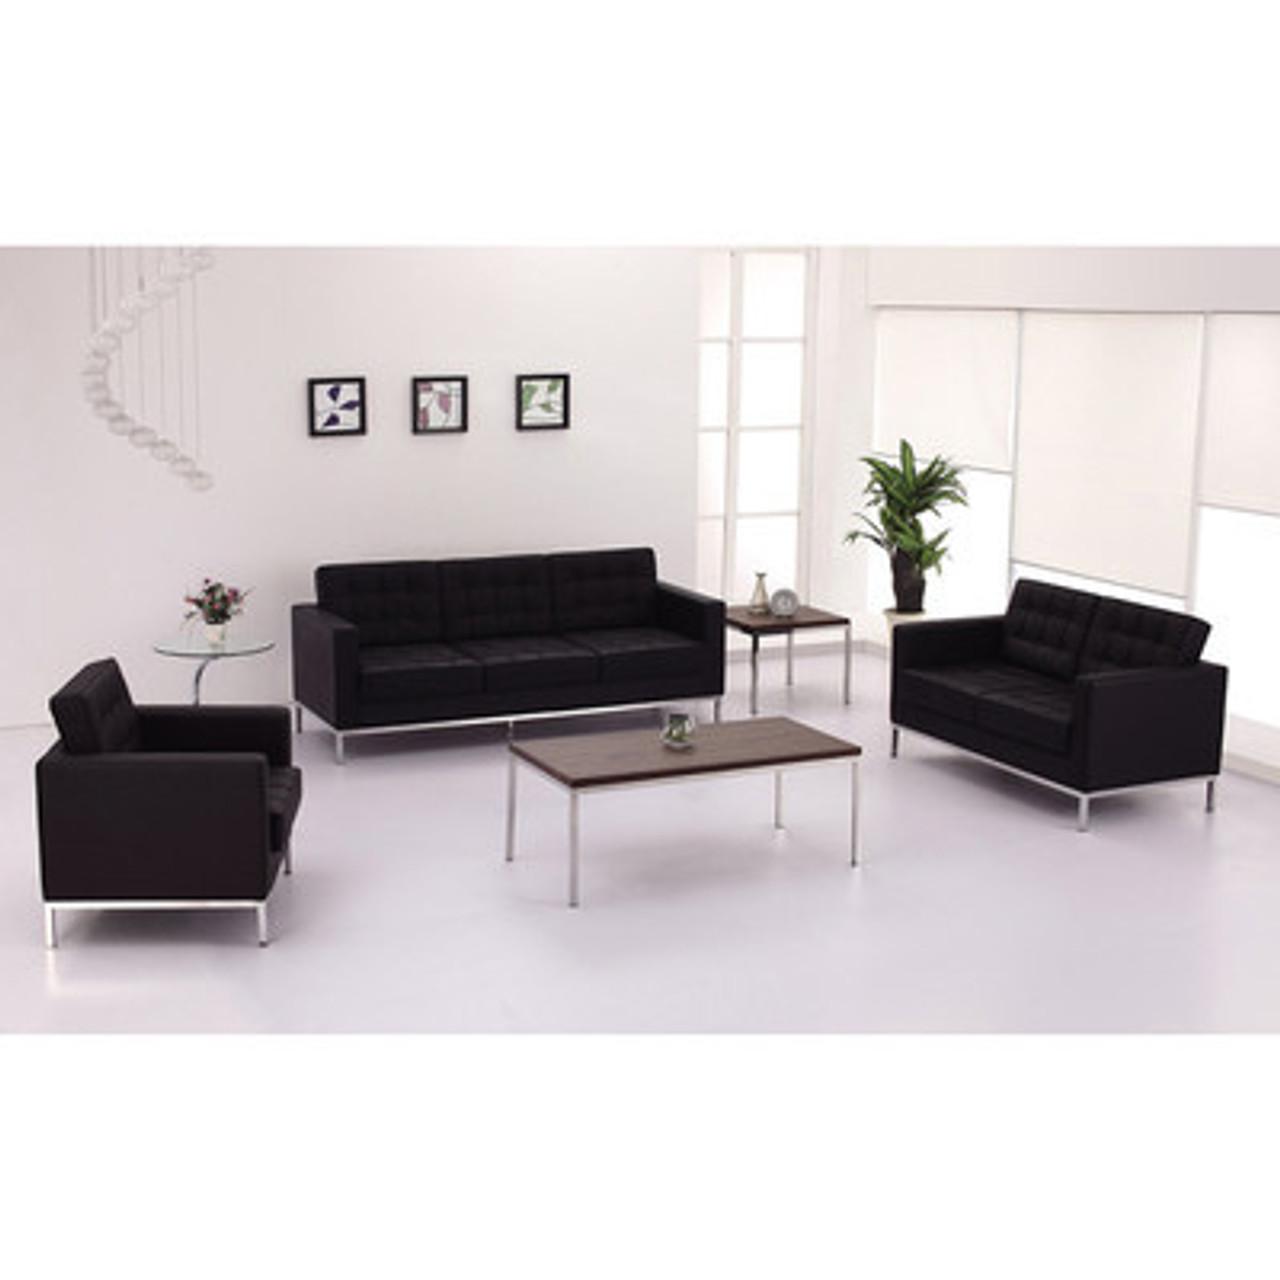 3pc Modern Leather Office Reception Sofa Set, FF-0441-12-S1